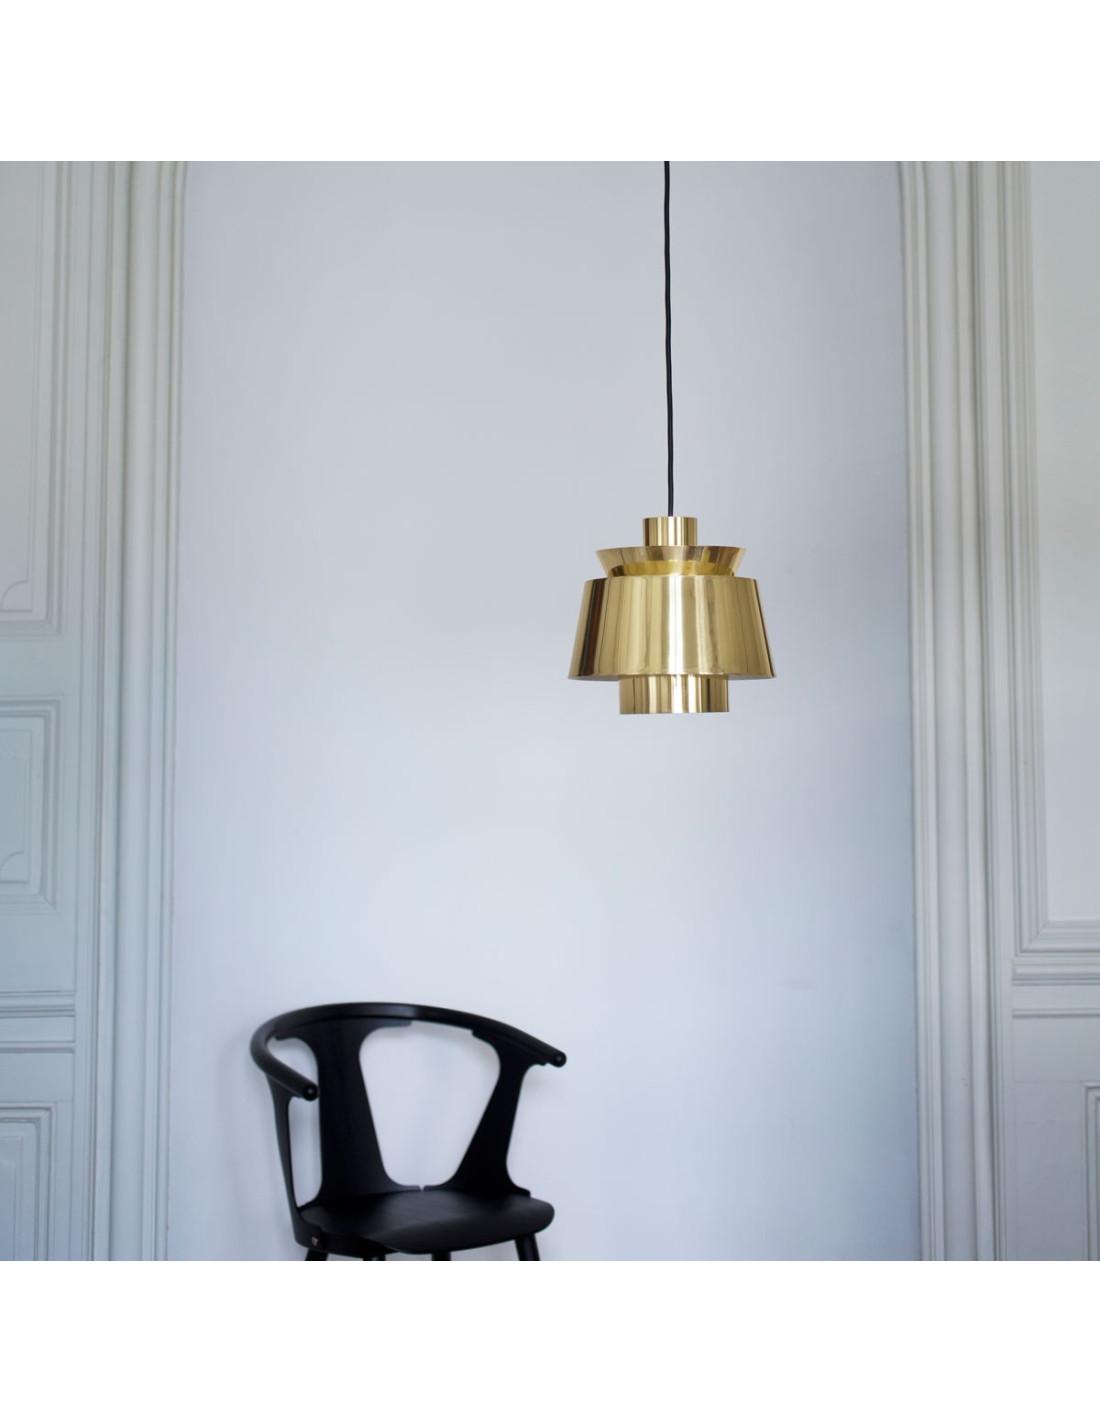 Utzon Lamp JU1, Design Jorn Utzon For And Tradition